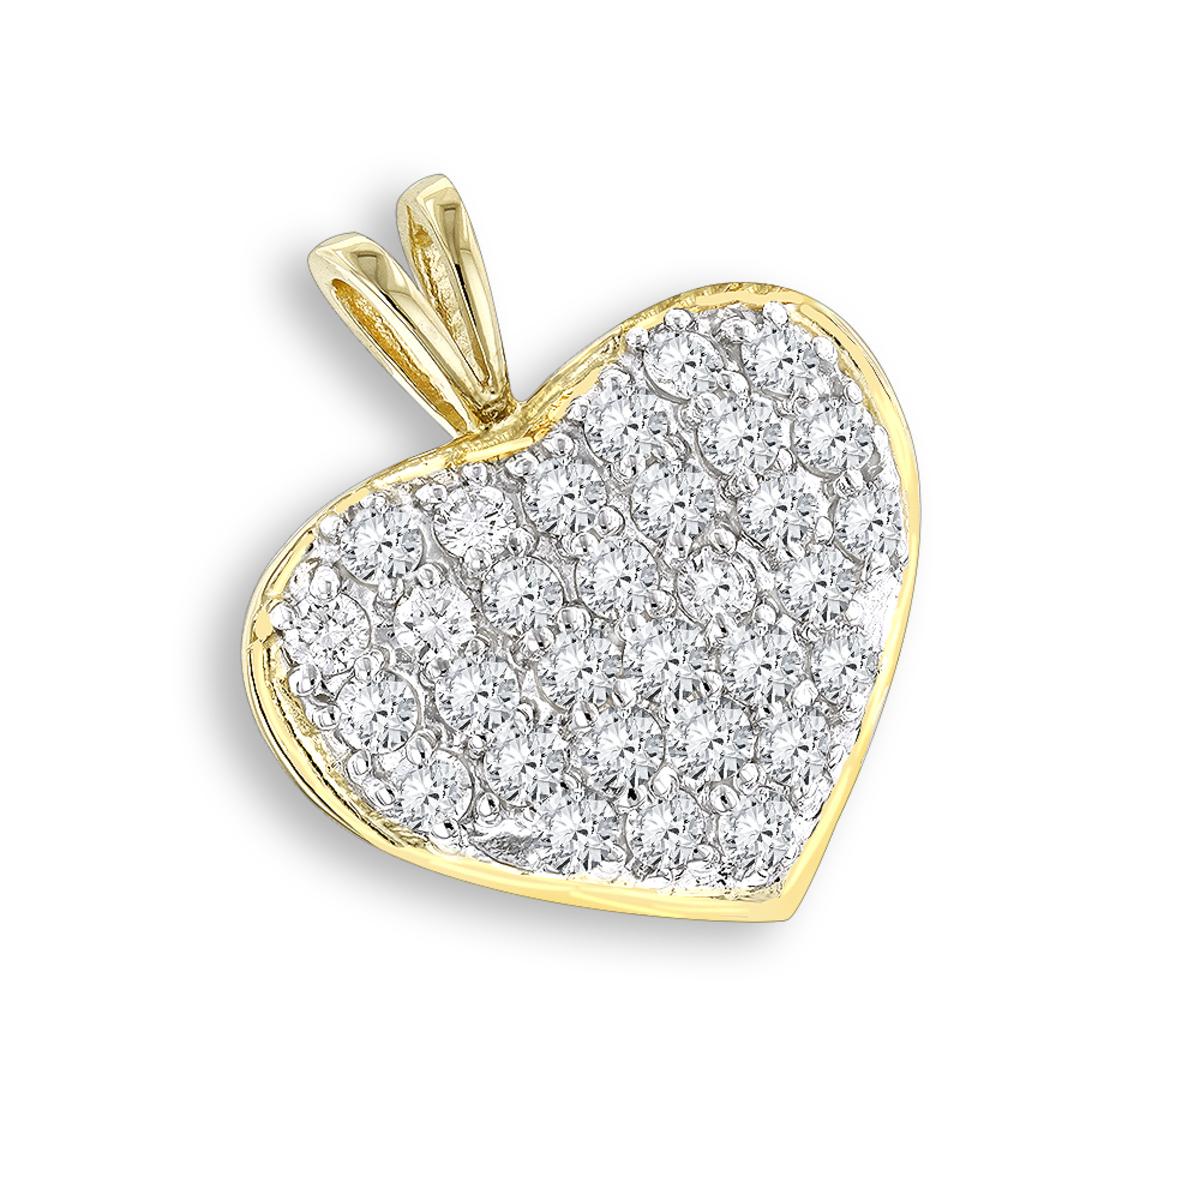 14K Gold 1 Carat Diamond Heart Pendant by Luxurman